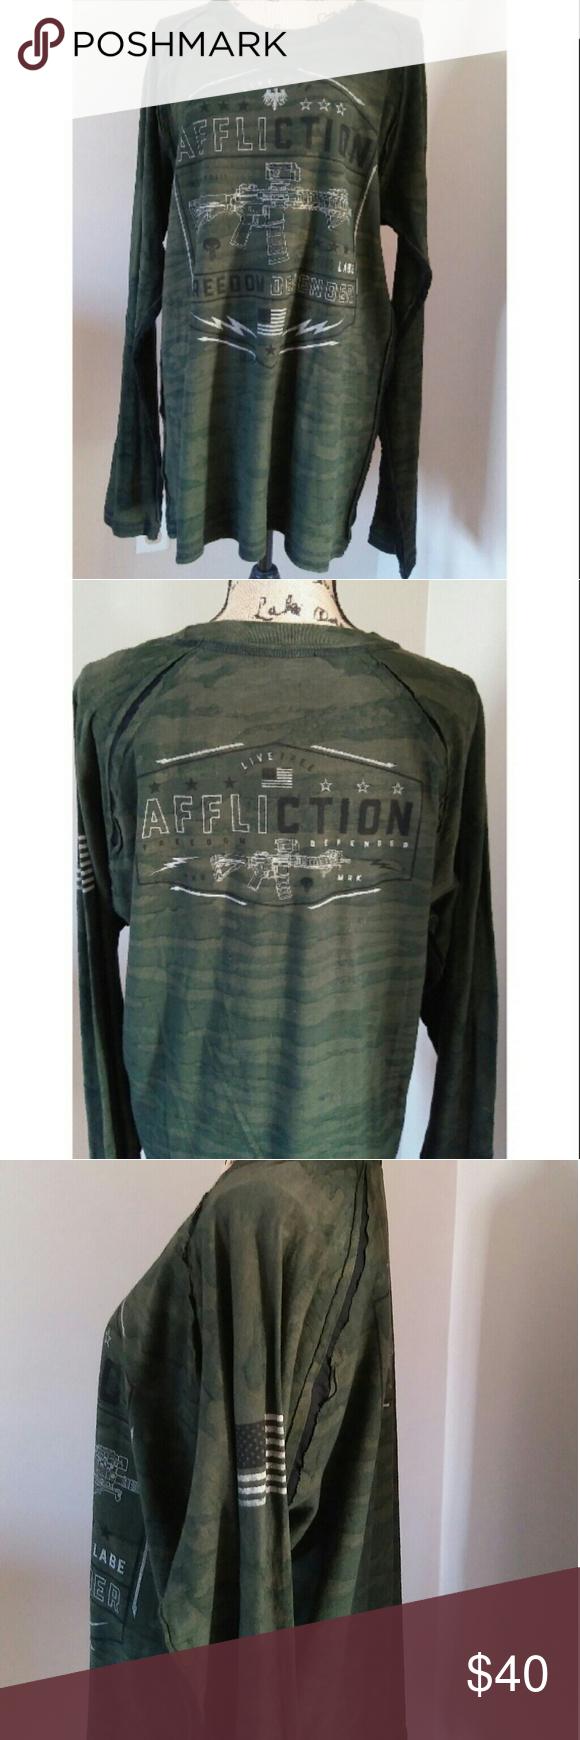 NWT Affliction Shirt Clothes design, Fashion, Fashion design